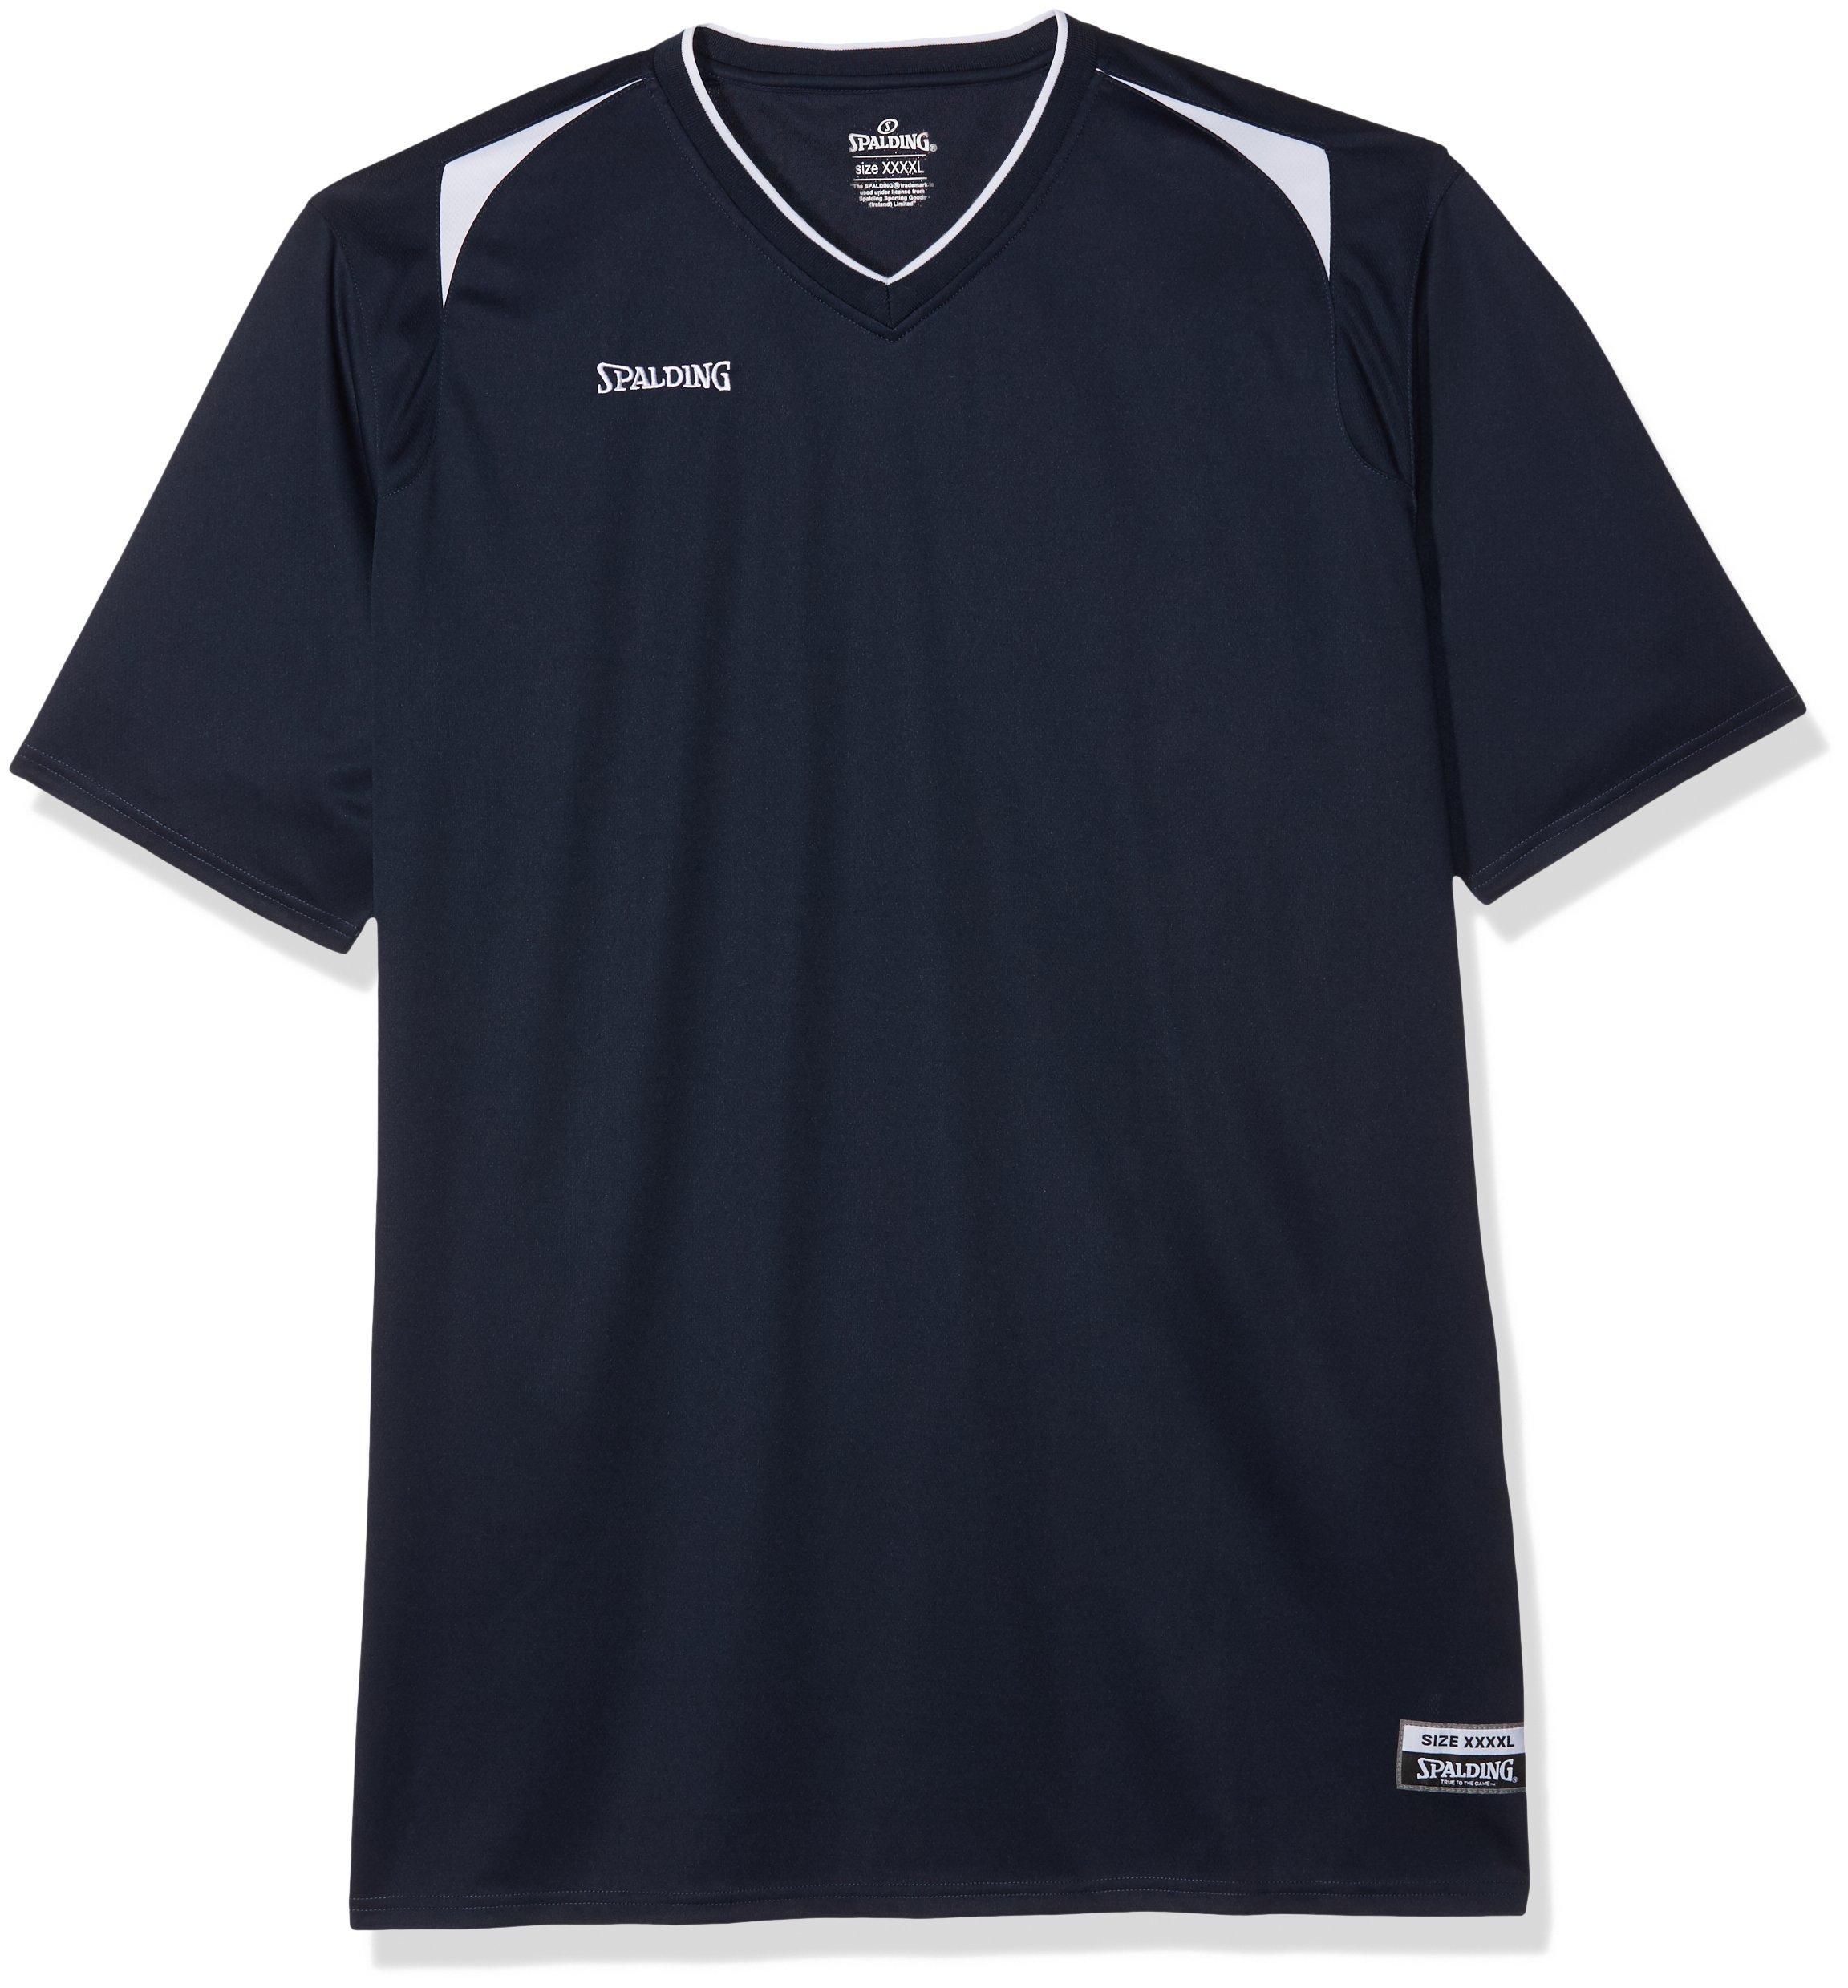 6b4ac686d256 Spalding Attack shooting shirt Teamsport – Just Sports UK